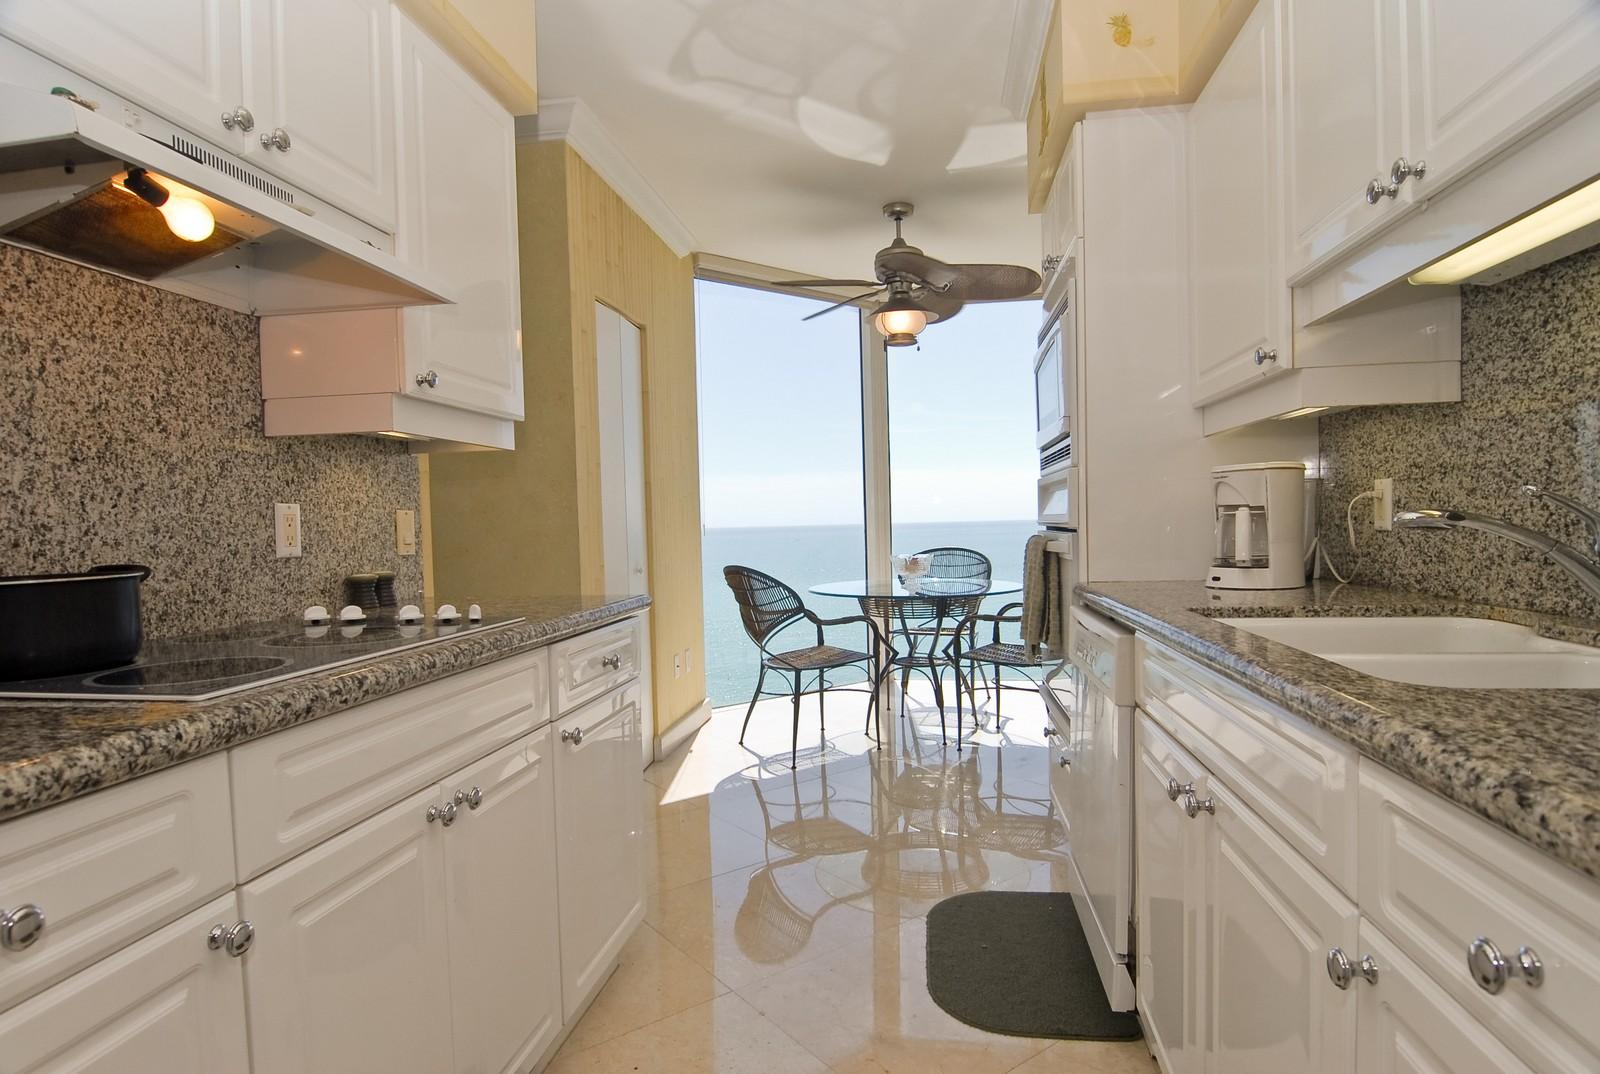 Real Estate Photography - 4779 Collins Ave, Unit 1901, Miami Beach, FL, 33140 - Kitchen / Breakfast Room